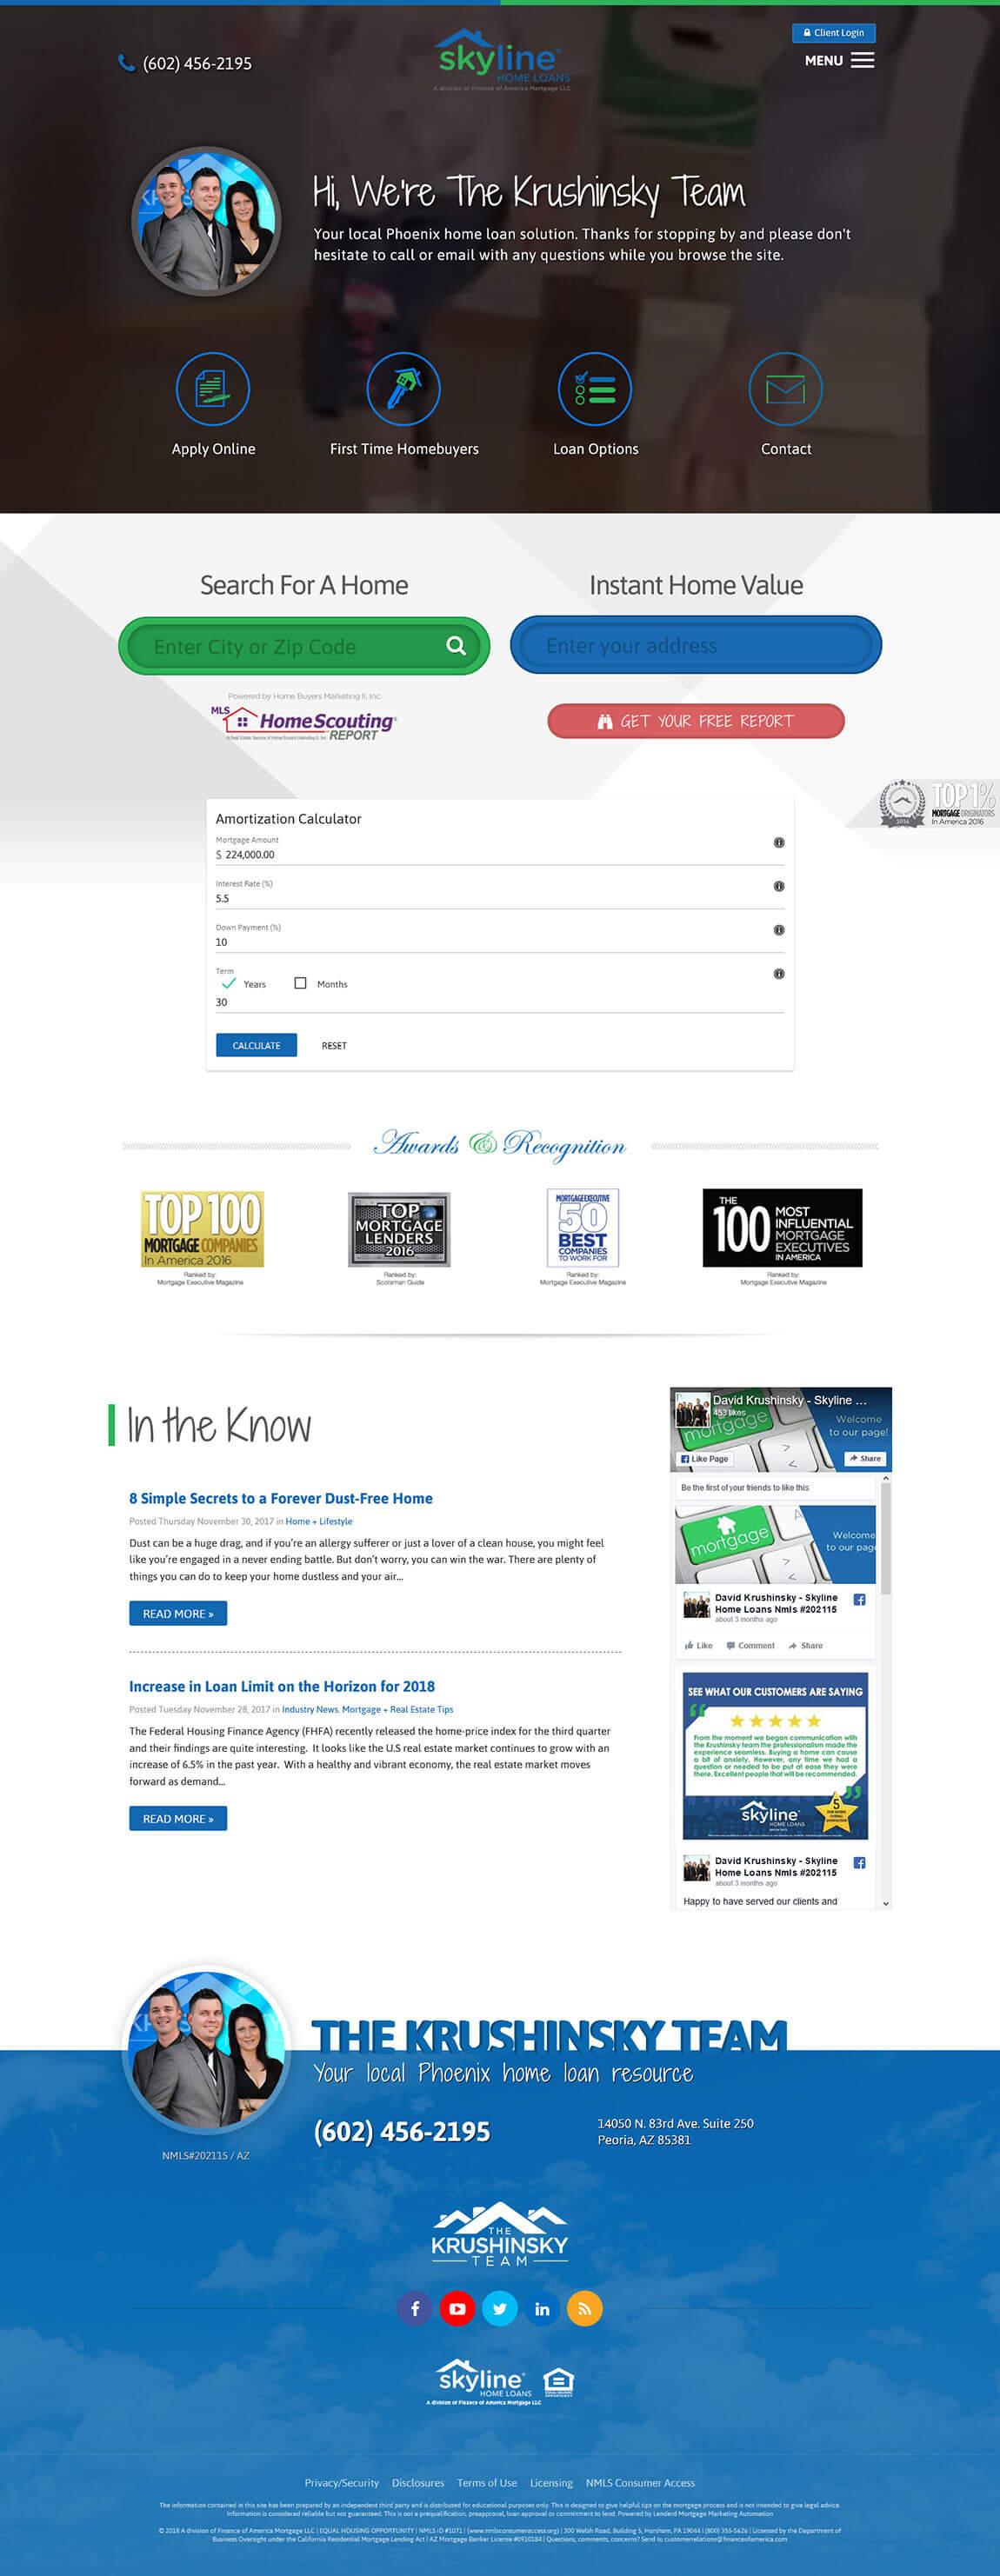 Skyline Home Loans Website Design